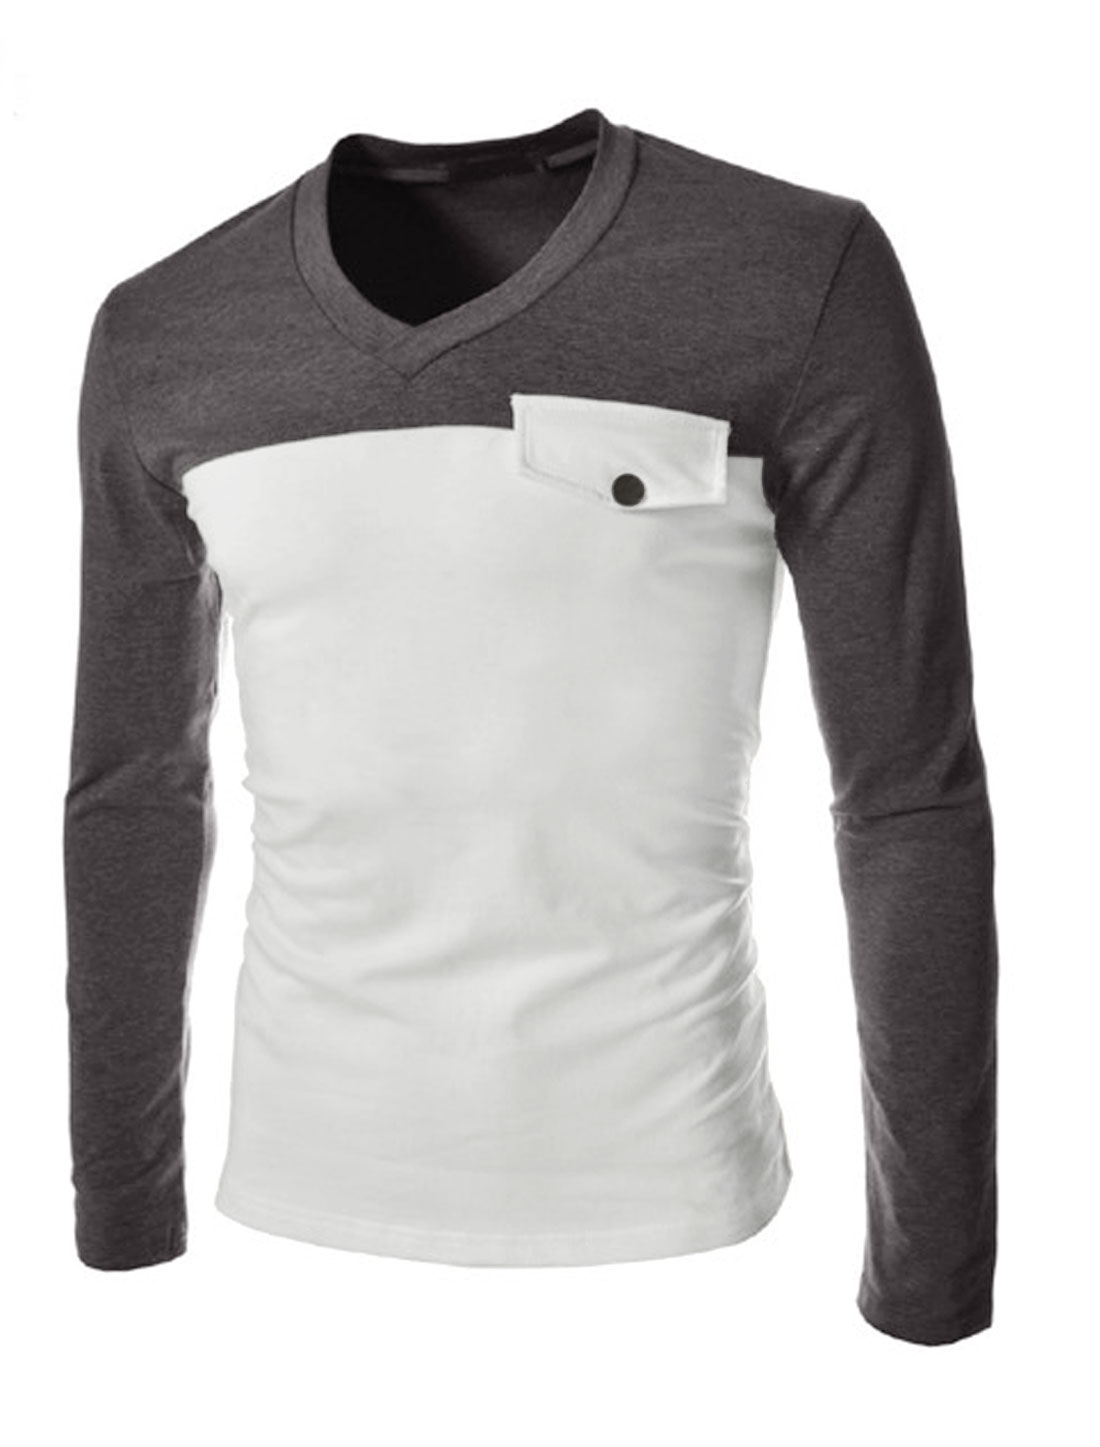 Men Long Sleeve V Neck Color Block Slim Fit Casual T-Shirt Dark Gray White M